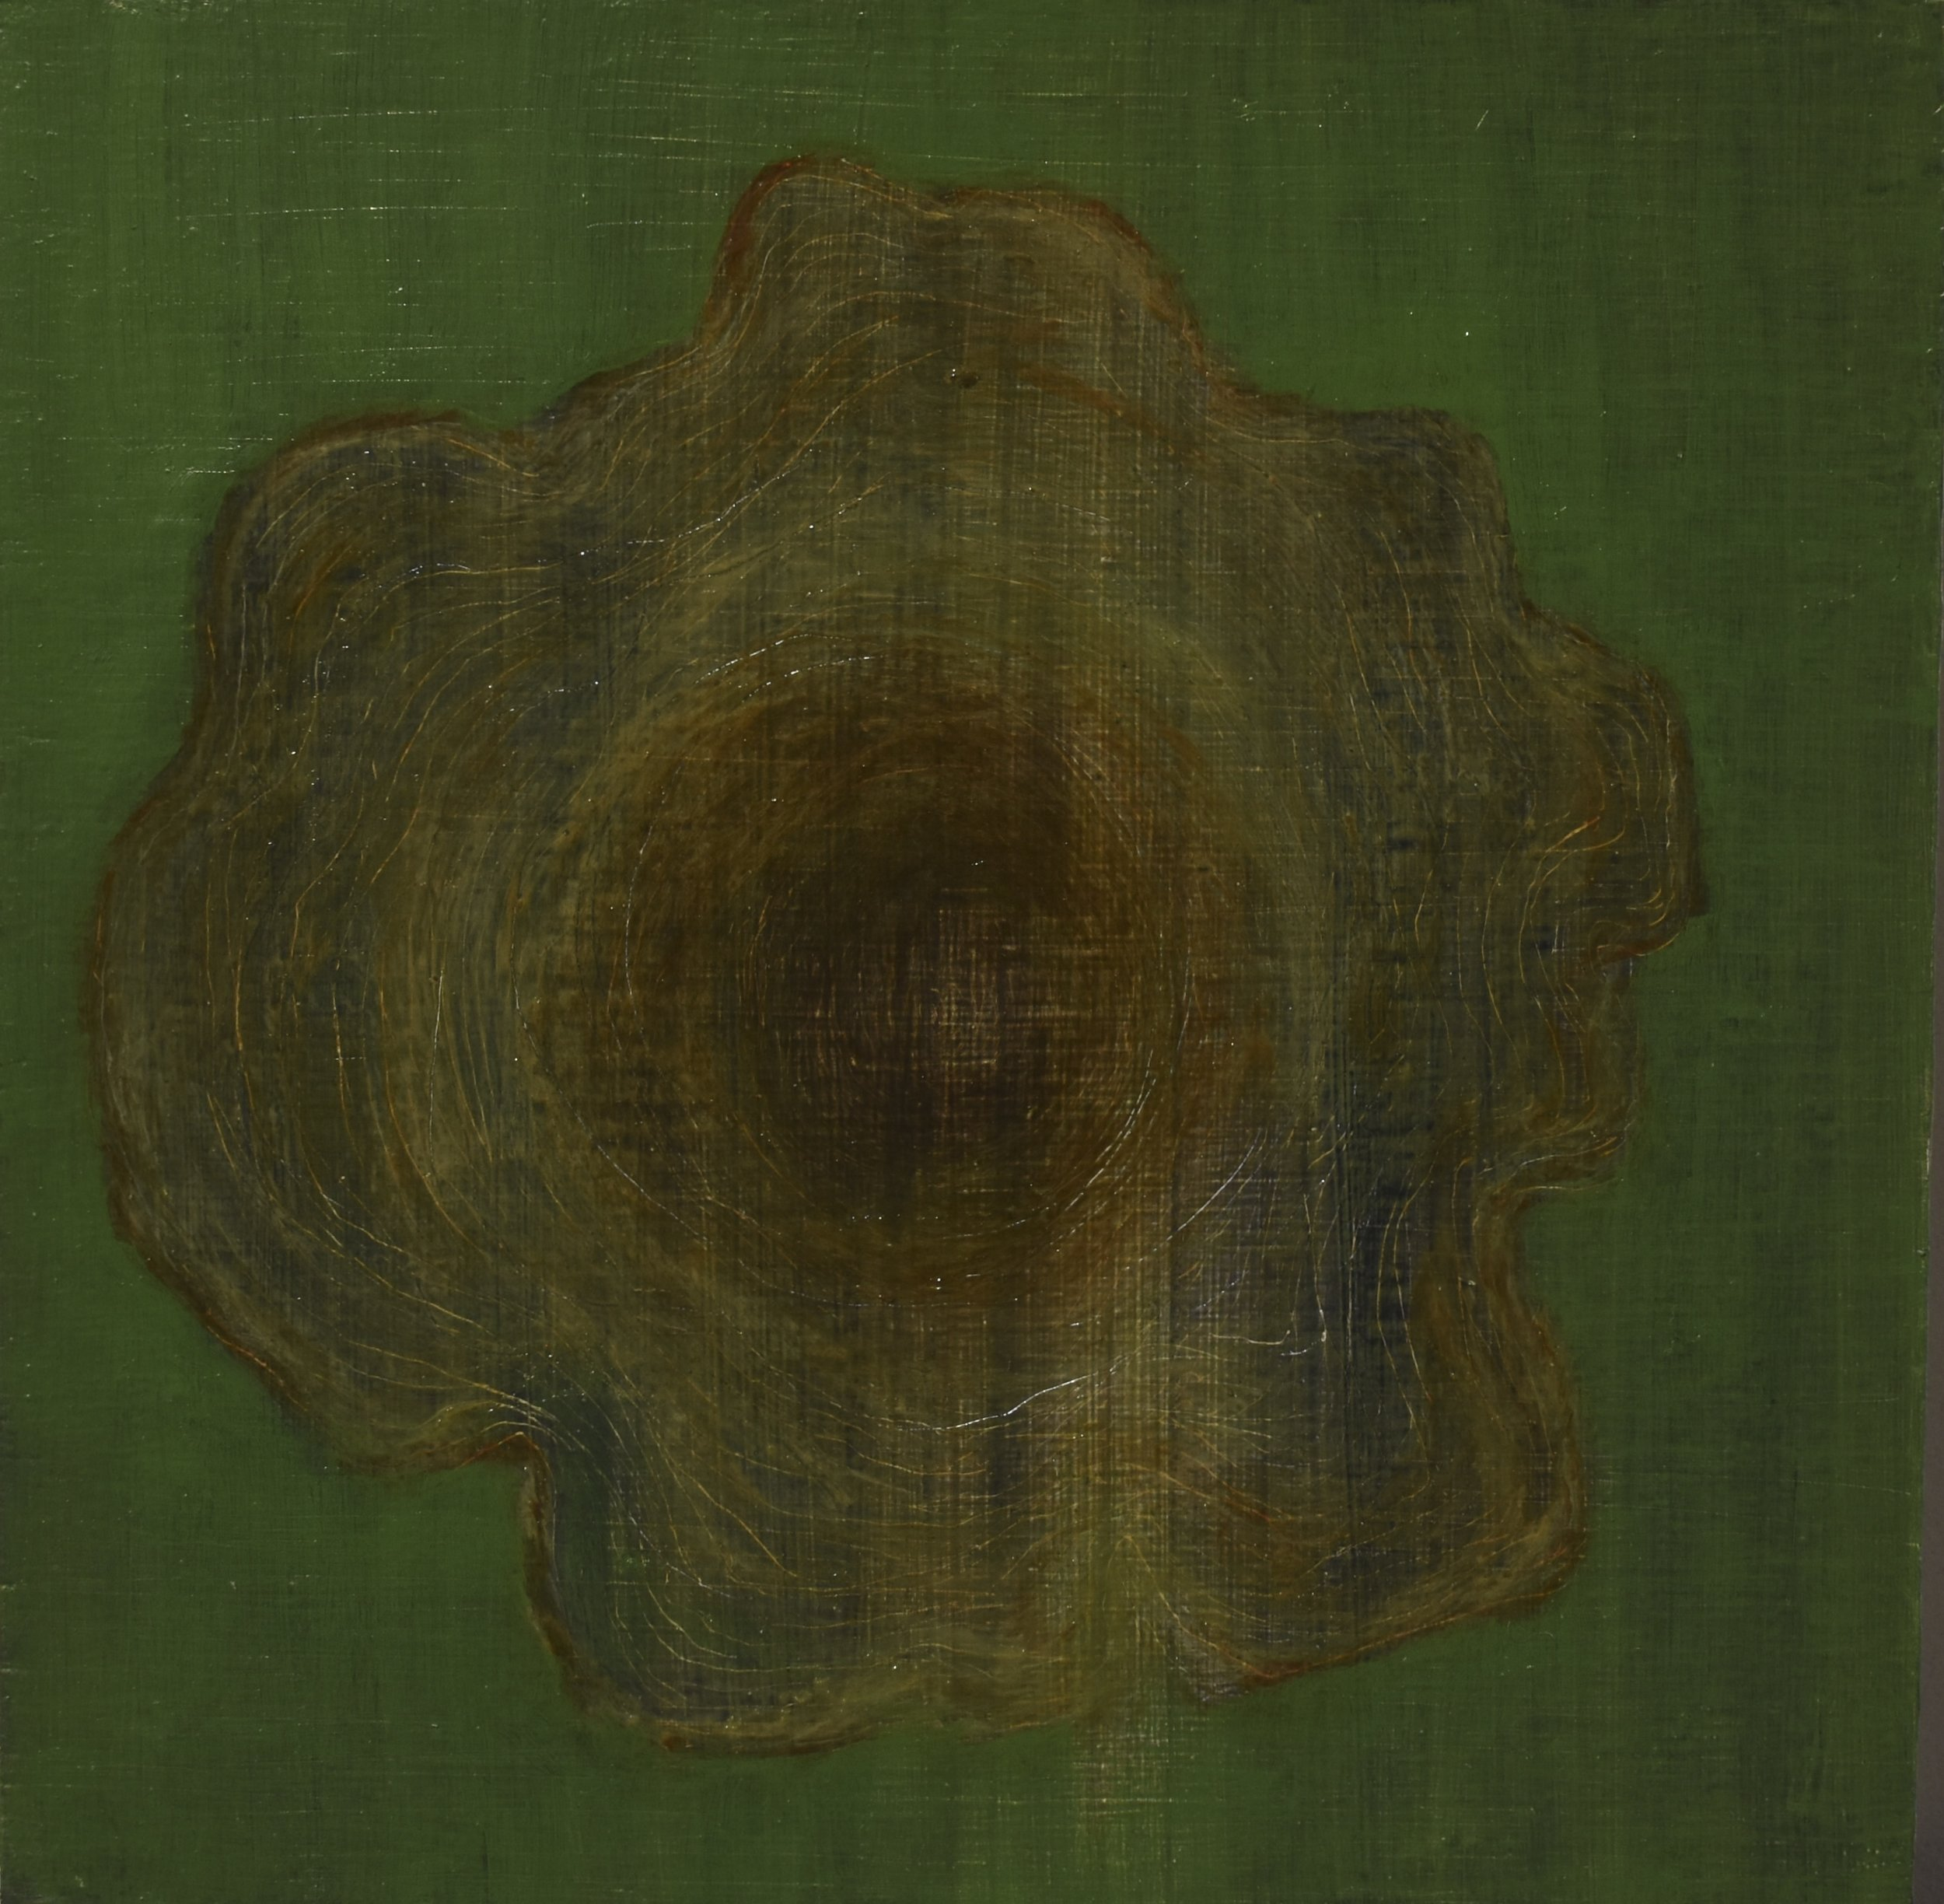 heartwood, 2017 oil on wood panel, 15 x 15 cm